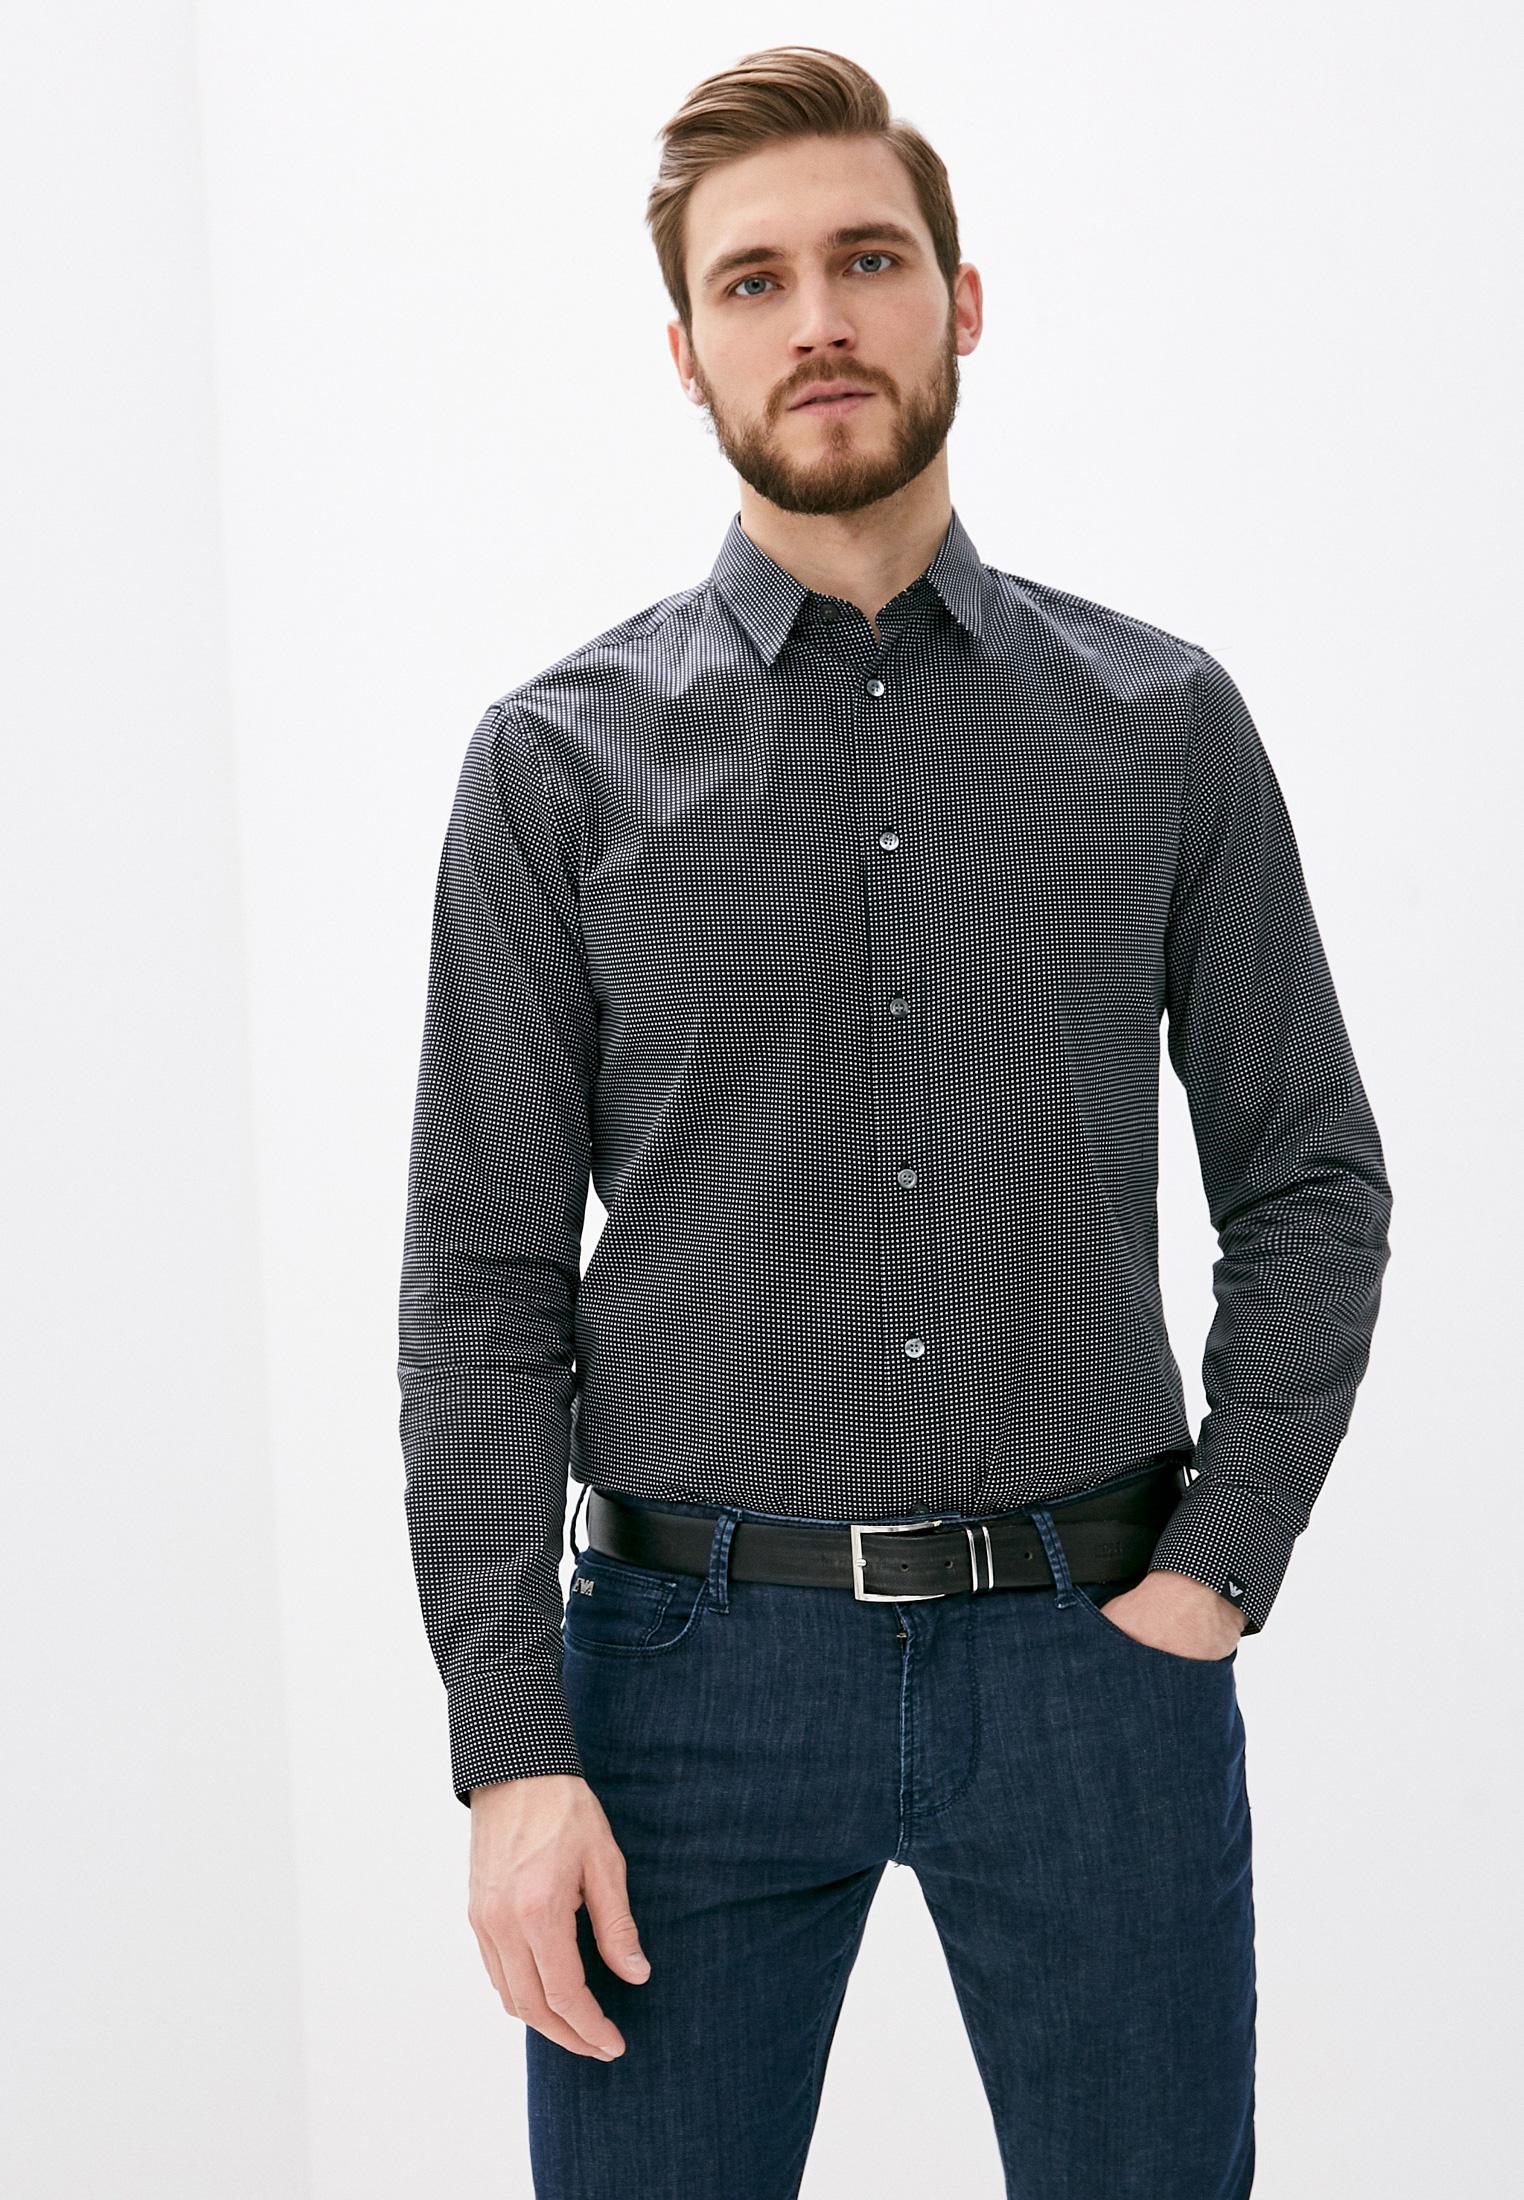 Рубашка с длинным рукавом Emporio Armani (Эмпорио Армани) Рубашка Emporio Armani